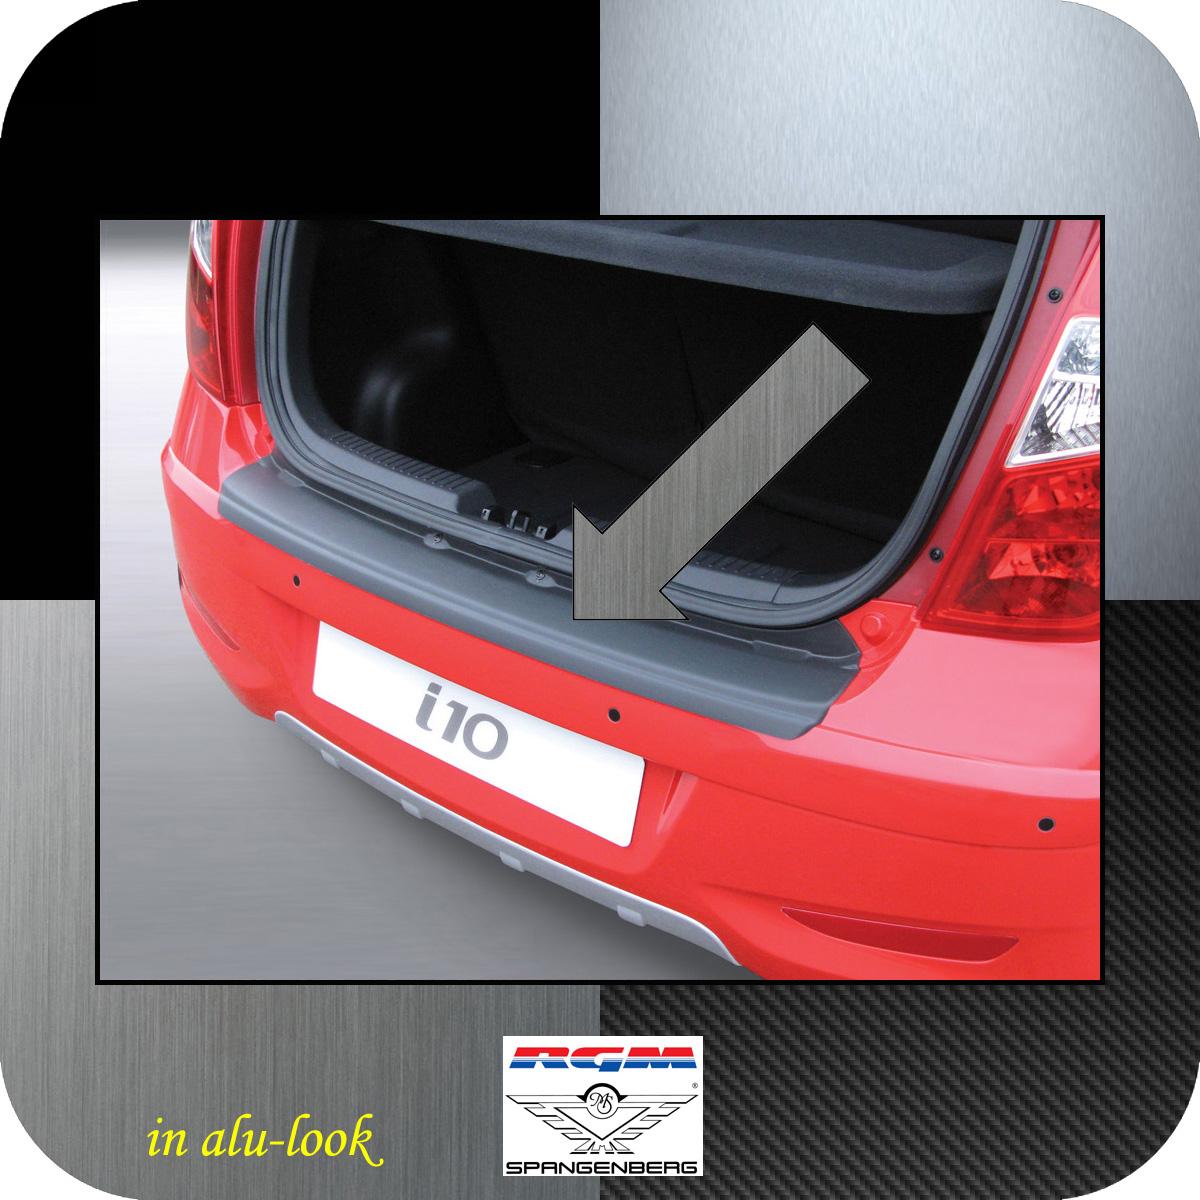 Ladekantenschutz Alu-Look Hyundai i10 I Schrägheck ab Mopf 2011-2013 3504497